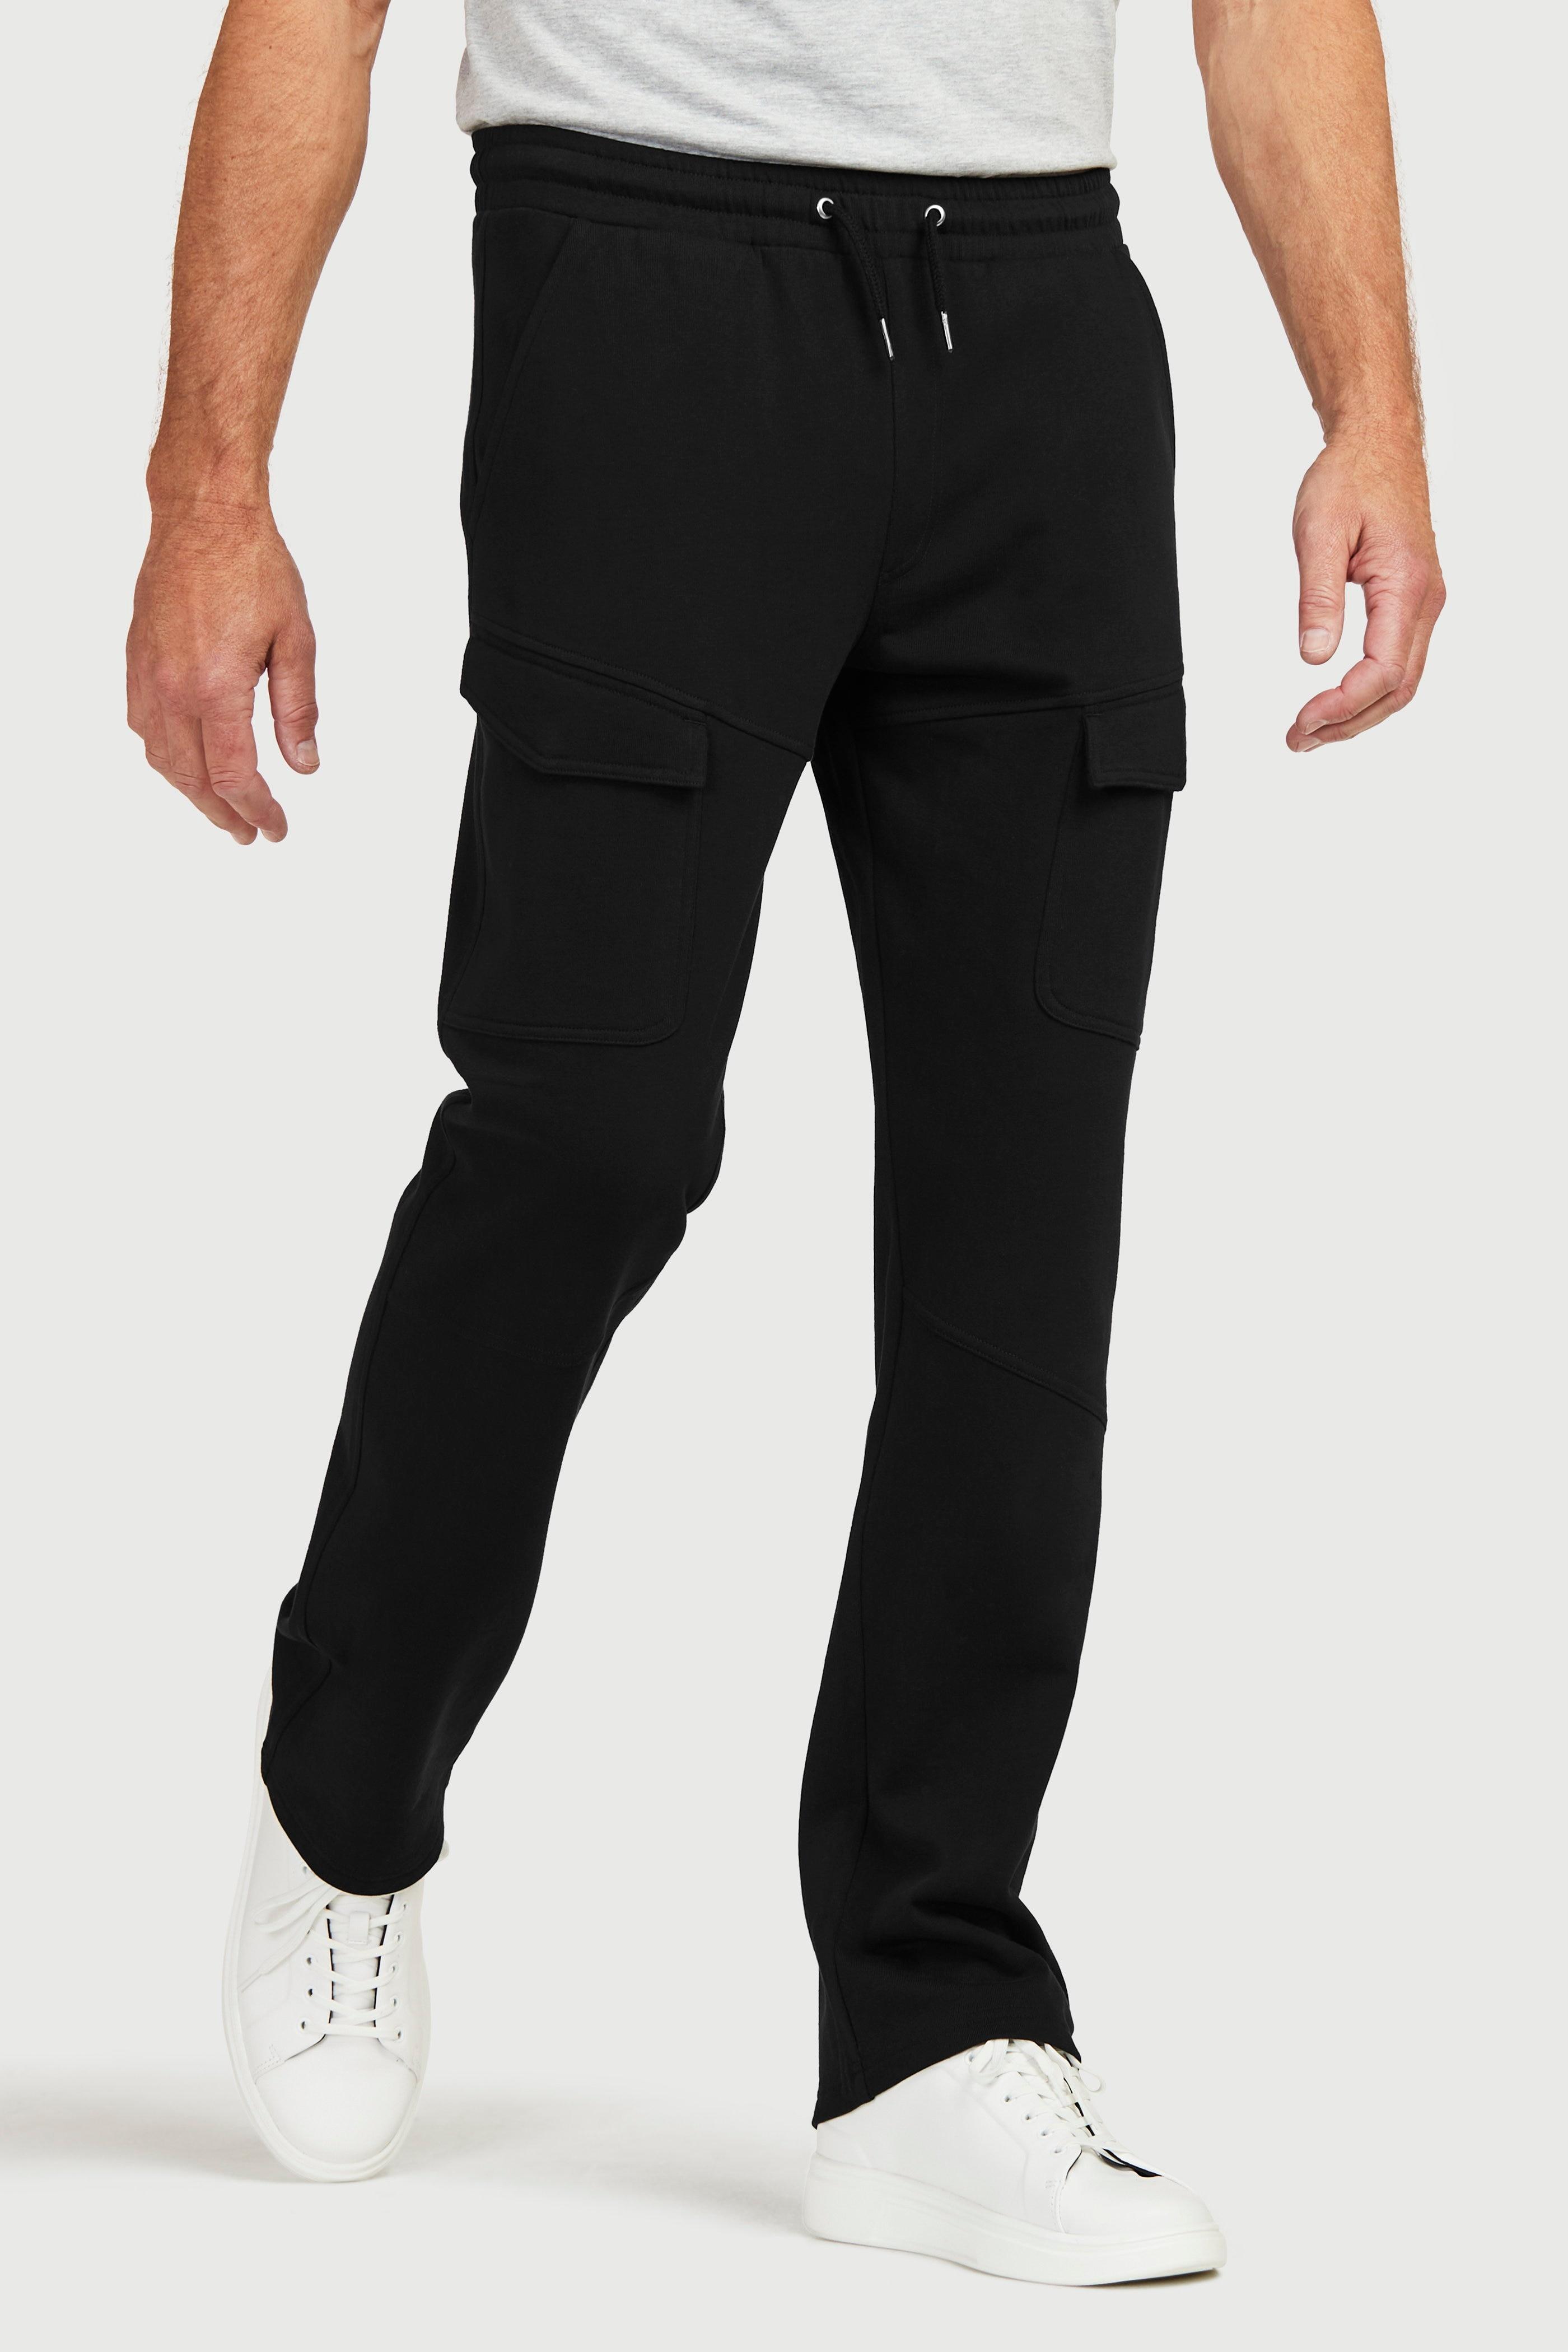 Baikas bikses ar cargo stila kabatām